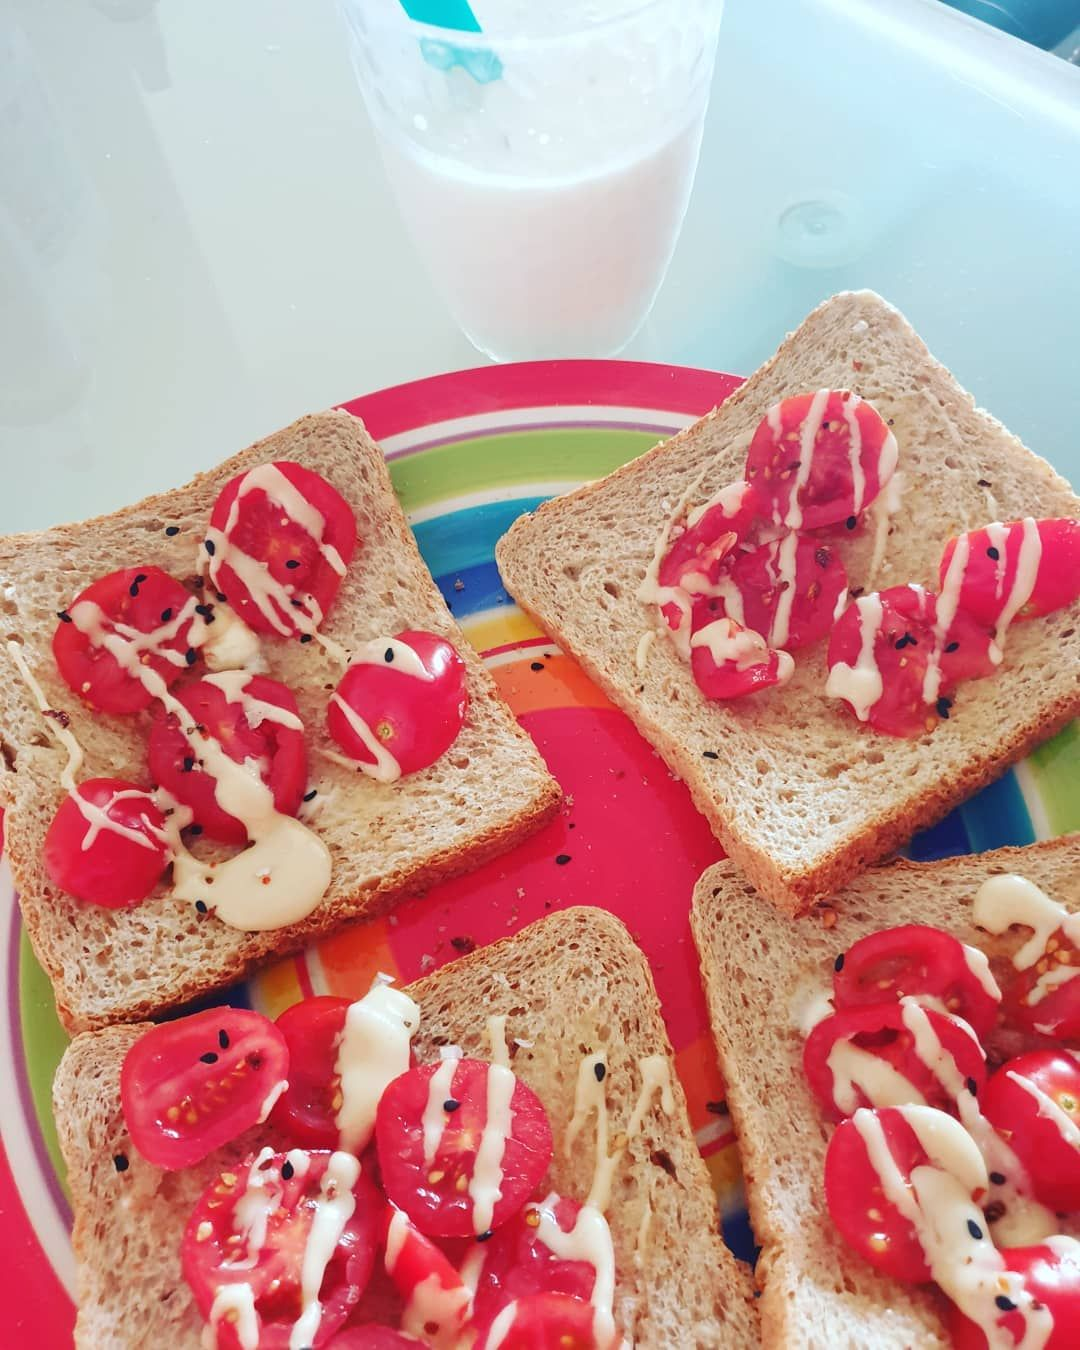 #preworkout #kefir #chunkyflavour #tomate #healthyfood #almondbutter #vollkorntoast #avocado #protei...